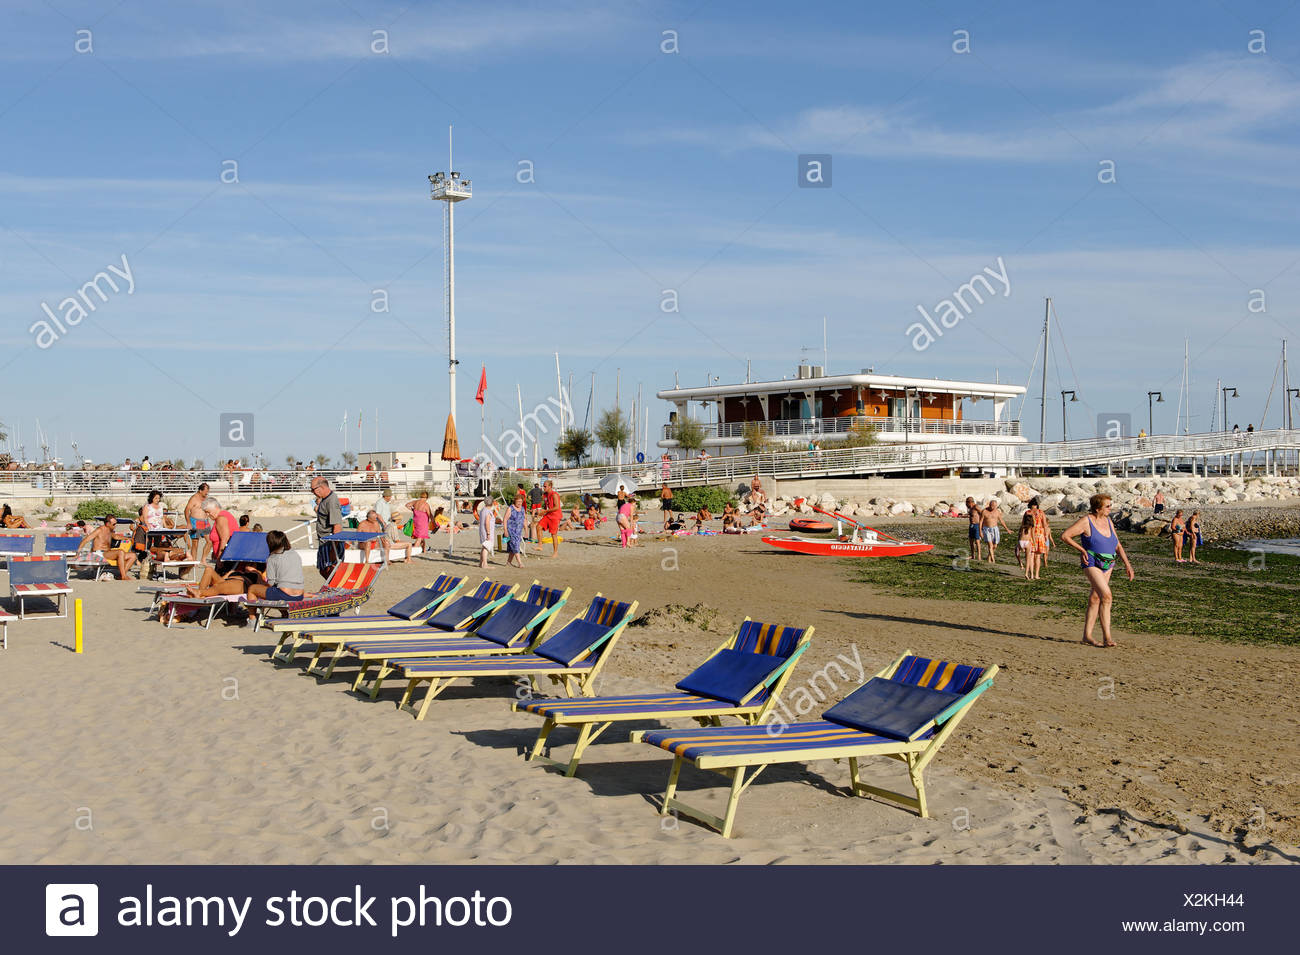 Beach at Cattolica, Cattolica, Province of Rimini, Emilia-Romagna, Adriatic coast, Italy, Europe - Stock Image